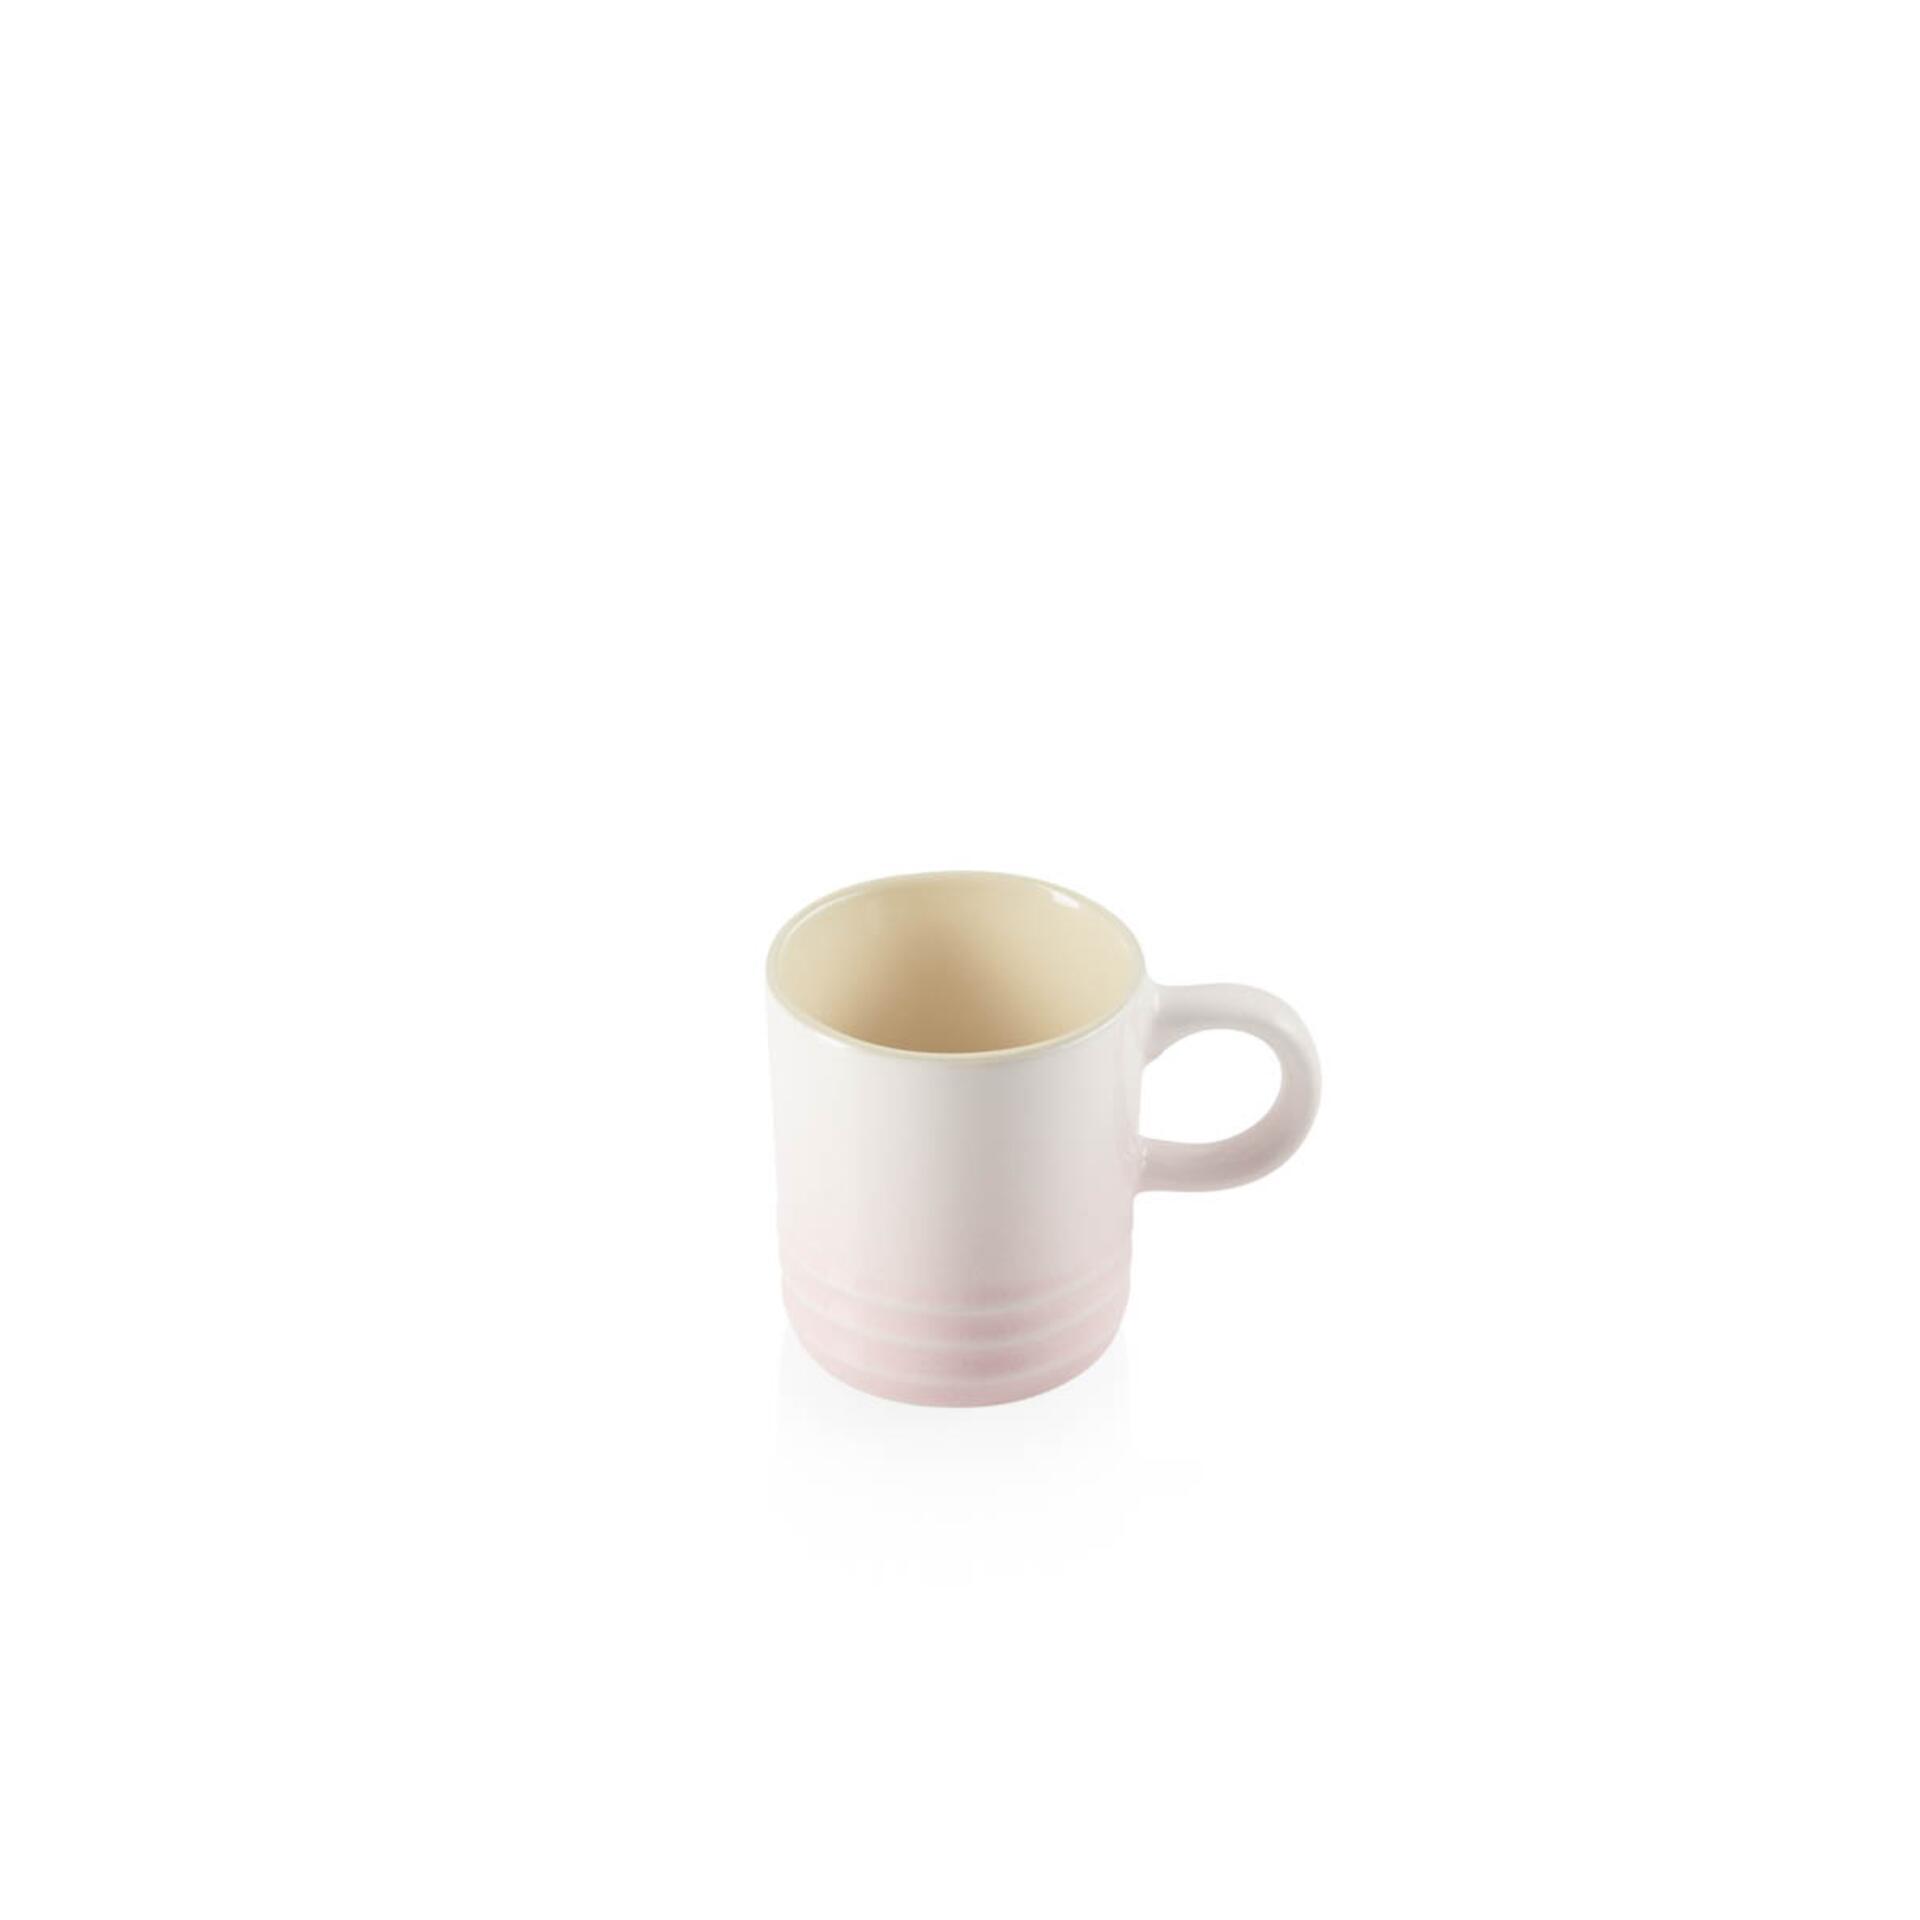 Le Creuset Espressotassen 70 ml Shell Pink